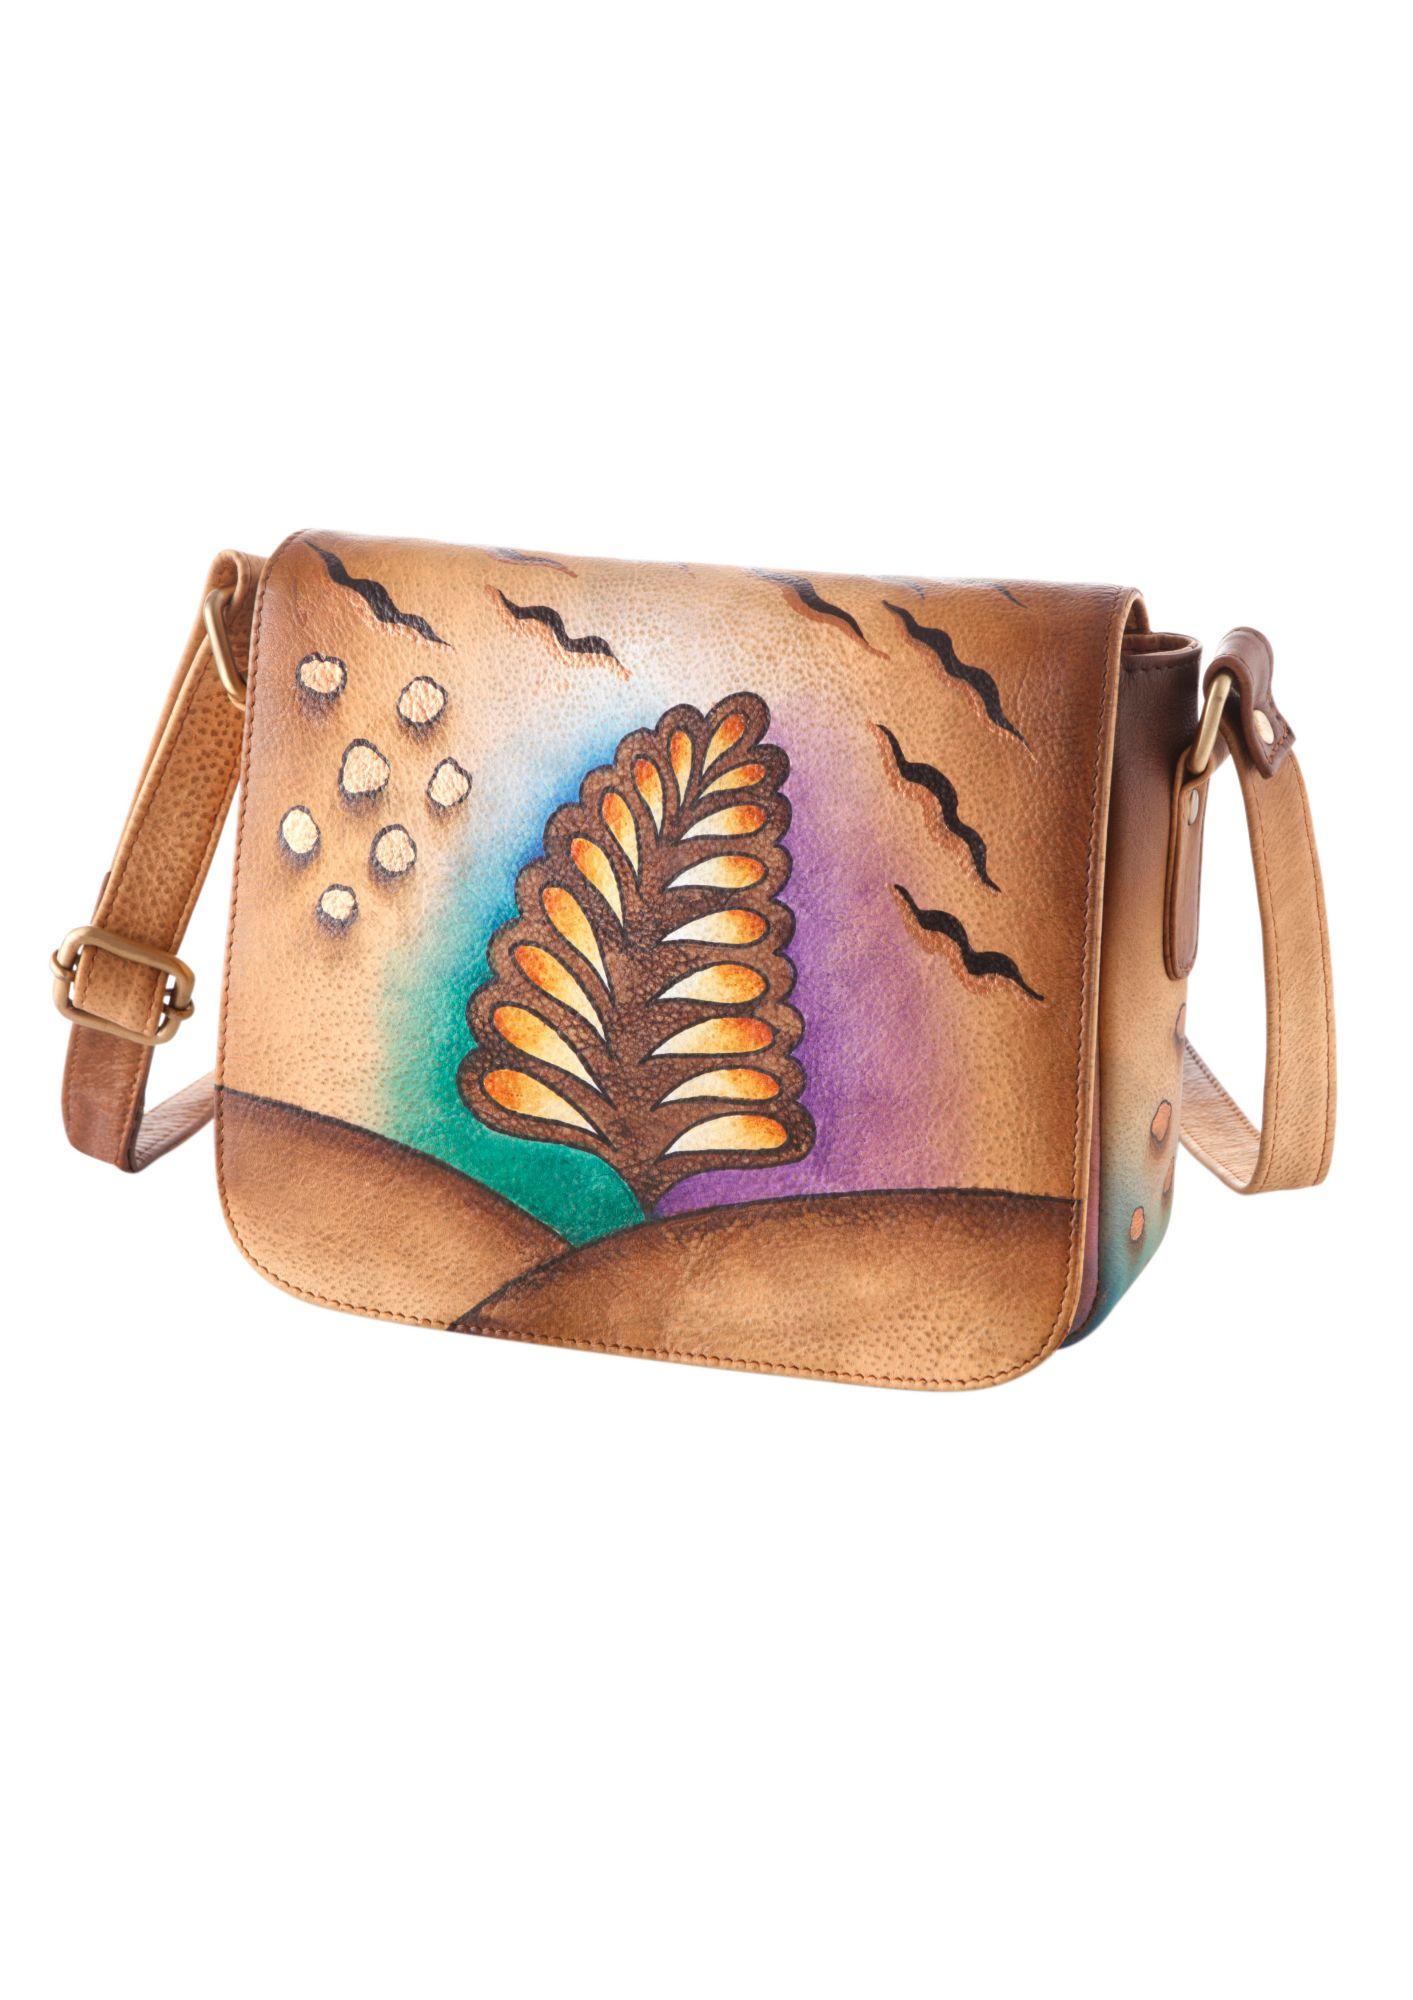 ART CRAFT Art & Craft Umhängetasche aus handbemaltem Leder